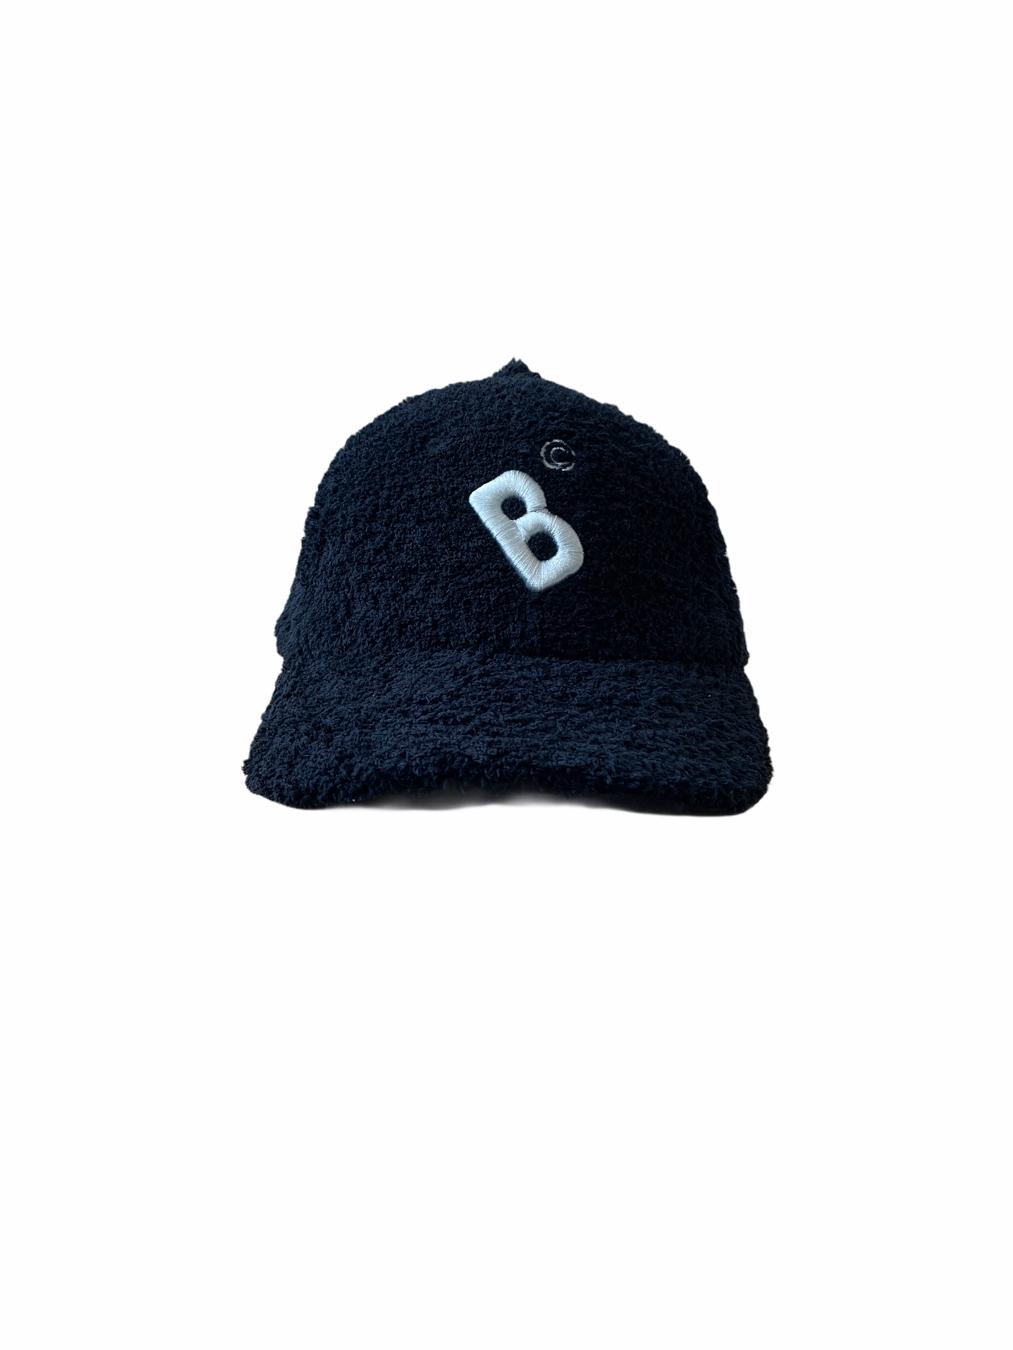 Bangkokr Cap (Black)